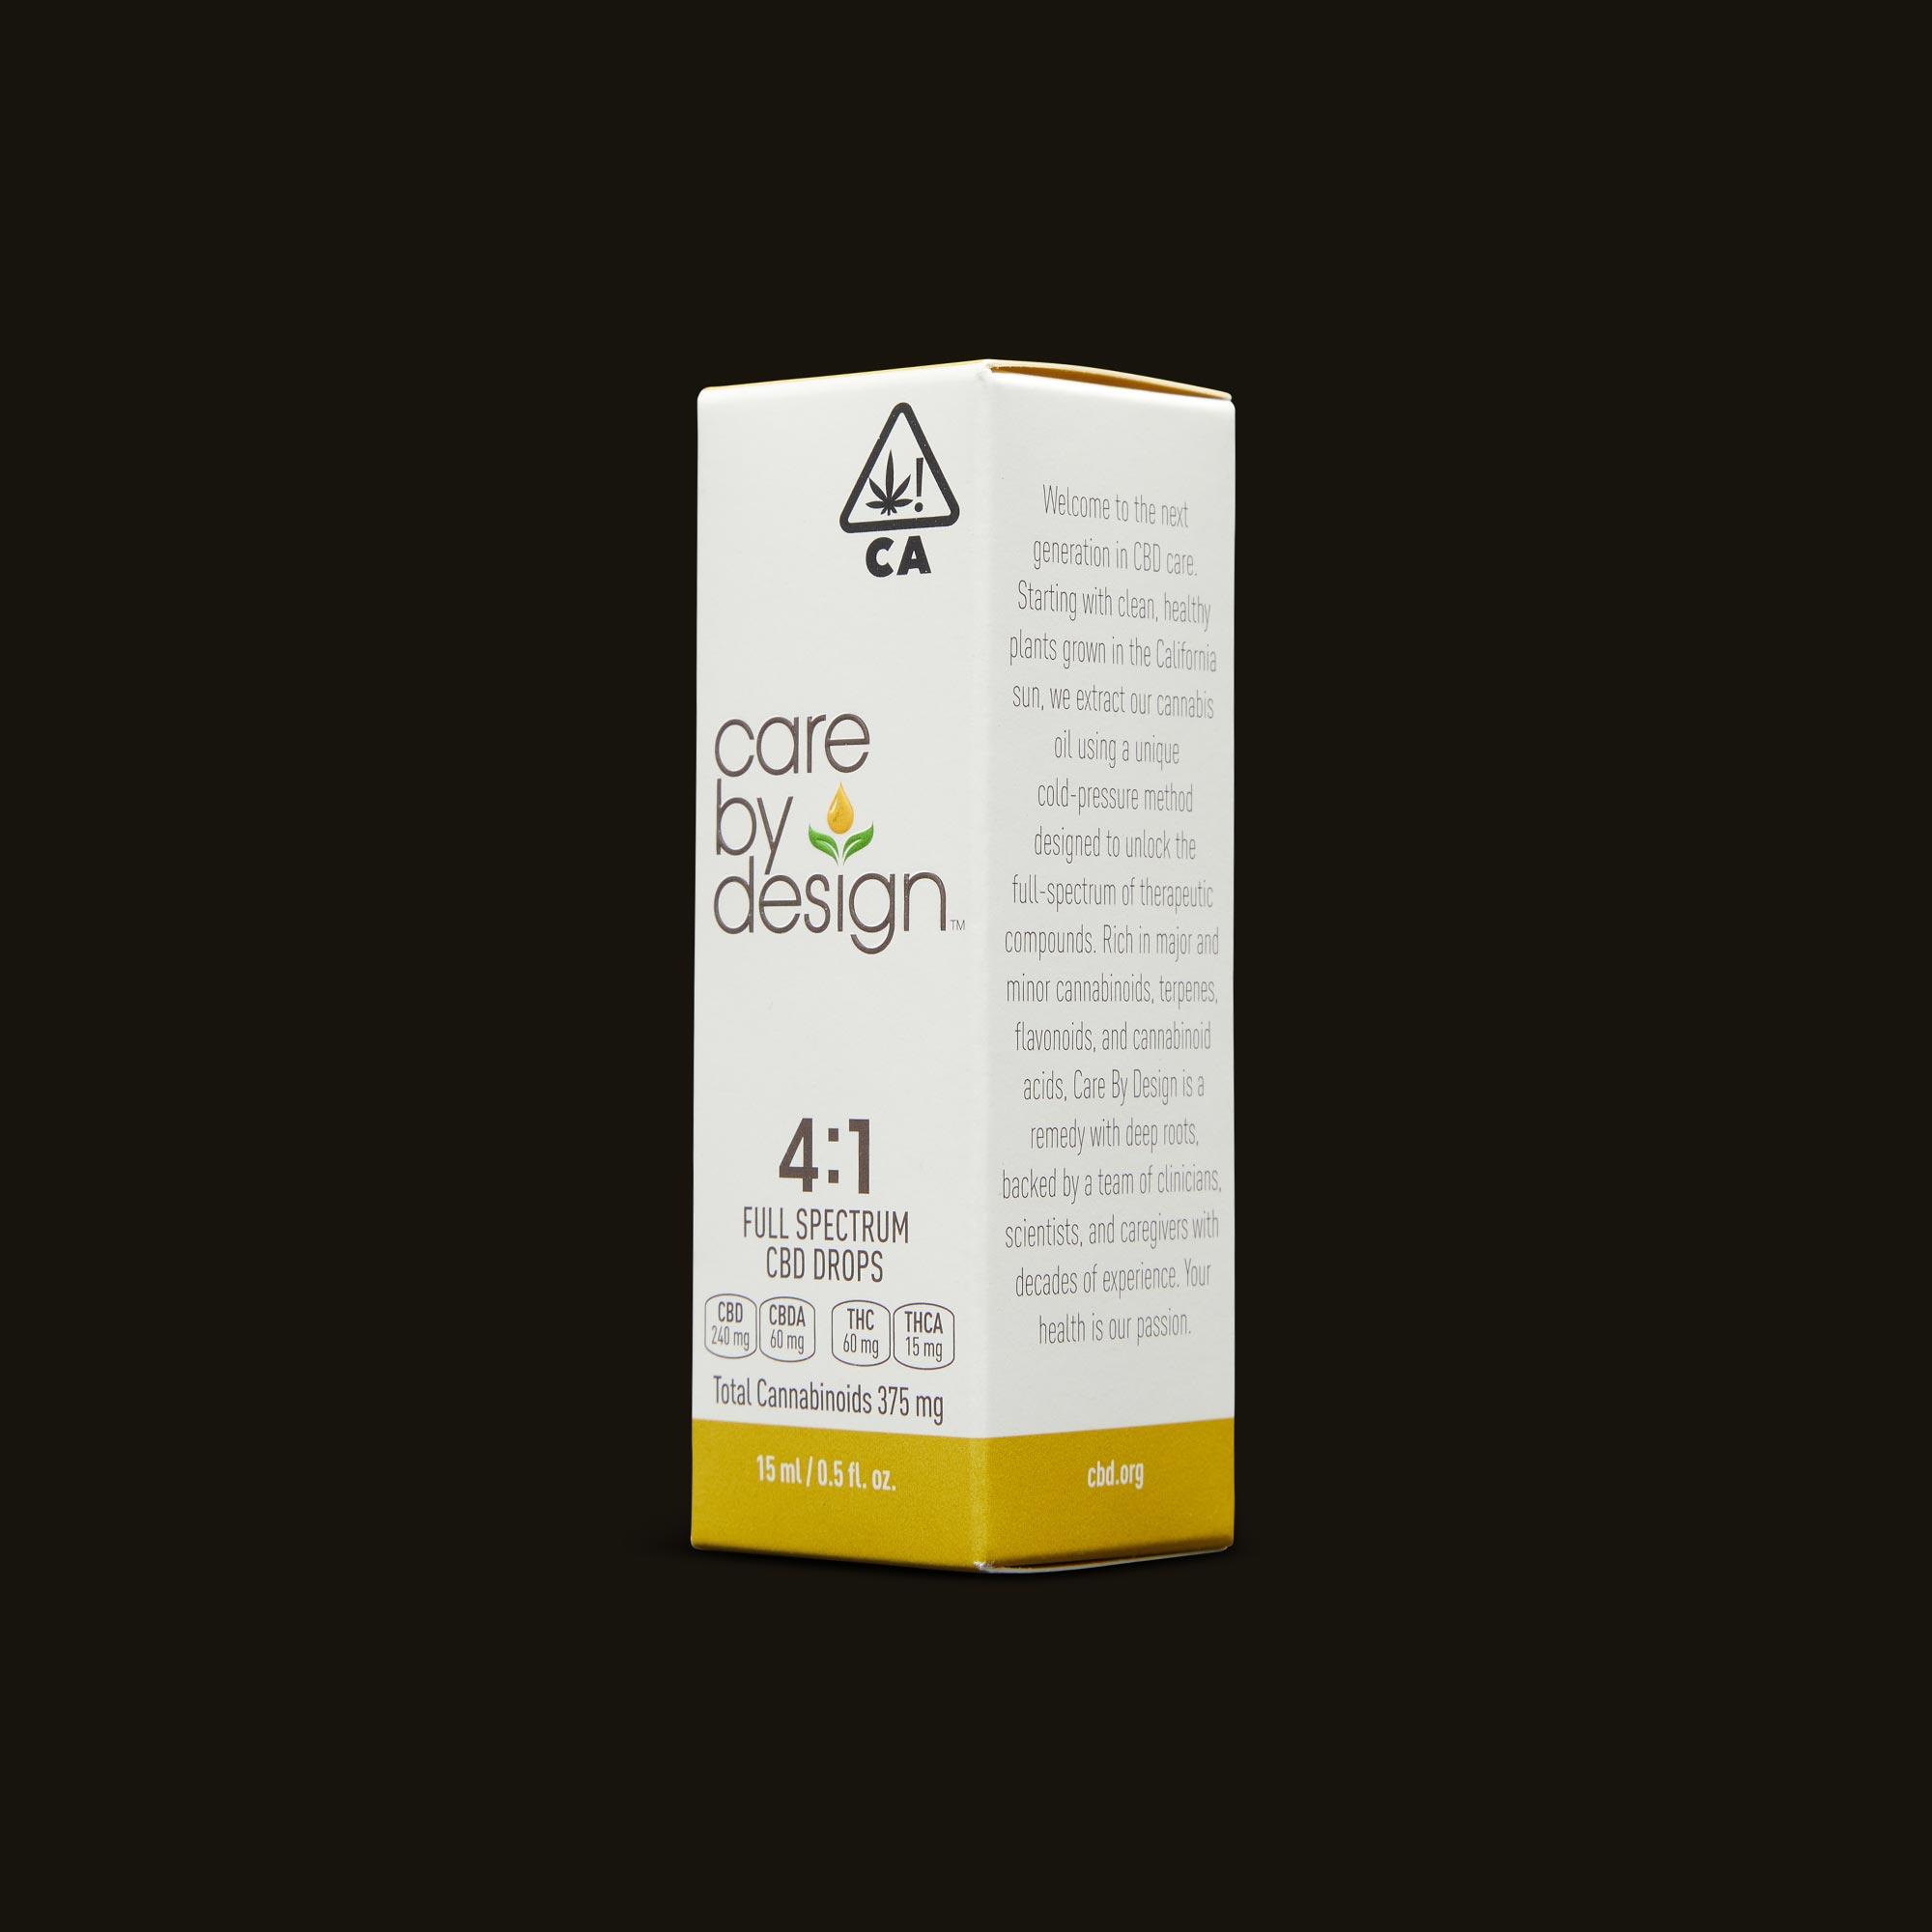 Care By Design 4:1 Full Spectrum CBD Drops - 0.5oz Side Packaging